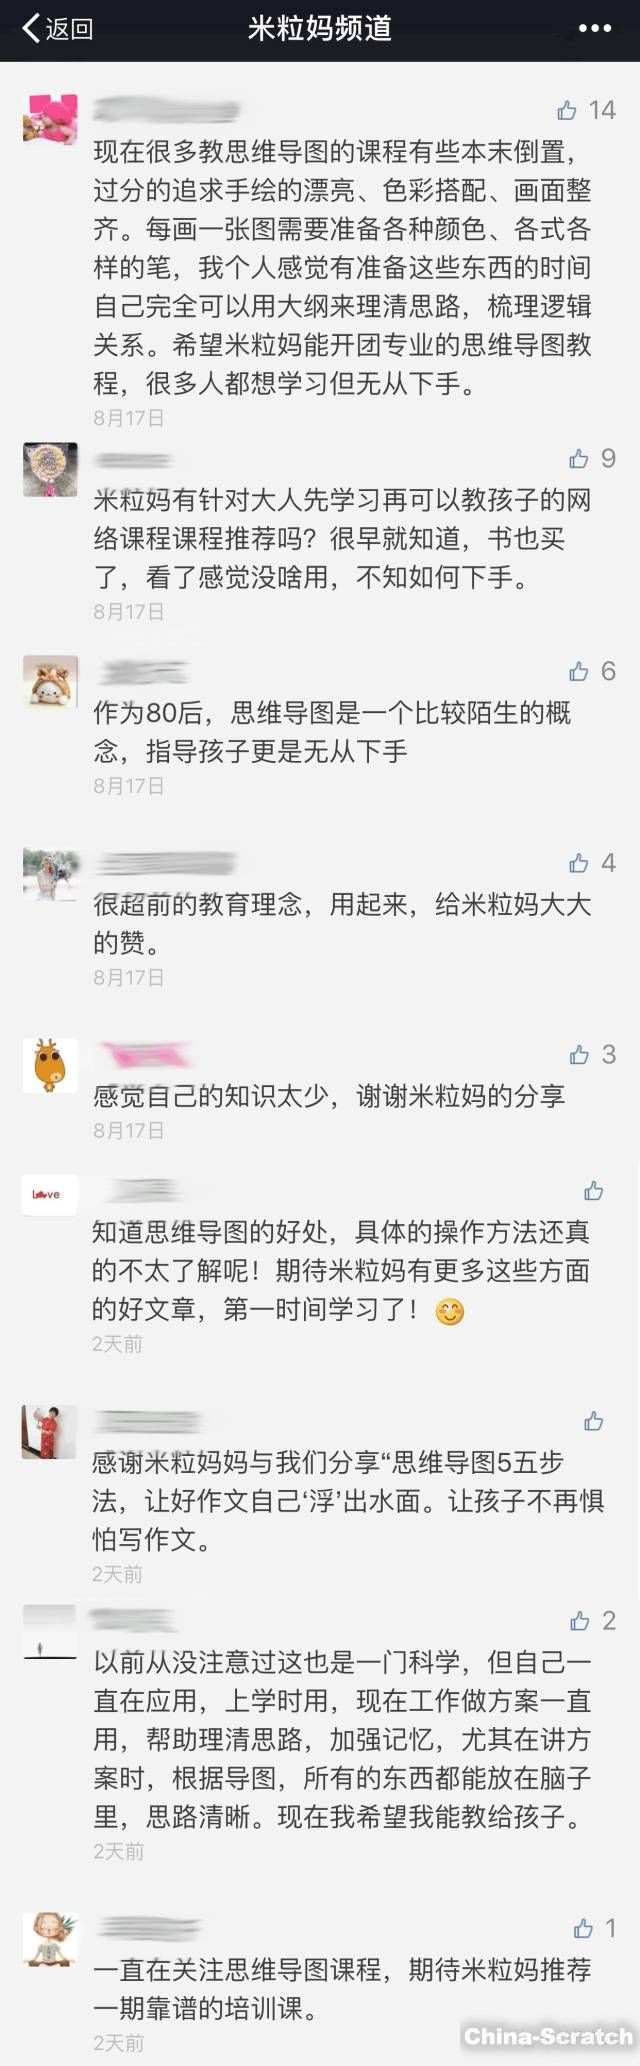 https://cdn.china-scratch.com/timg/180624/0011321T4-15.jpg